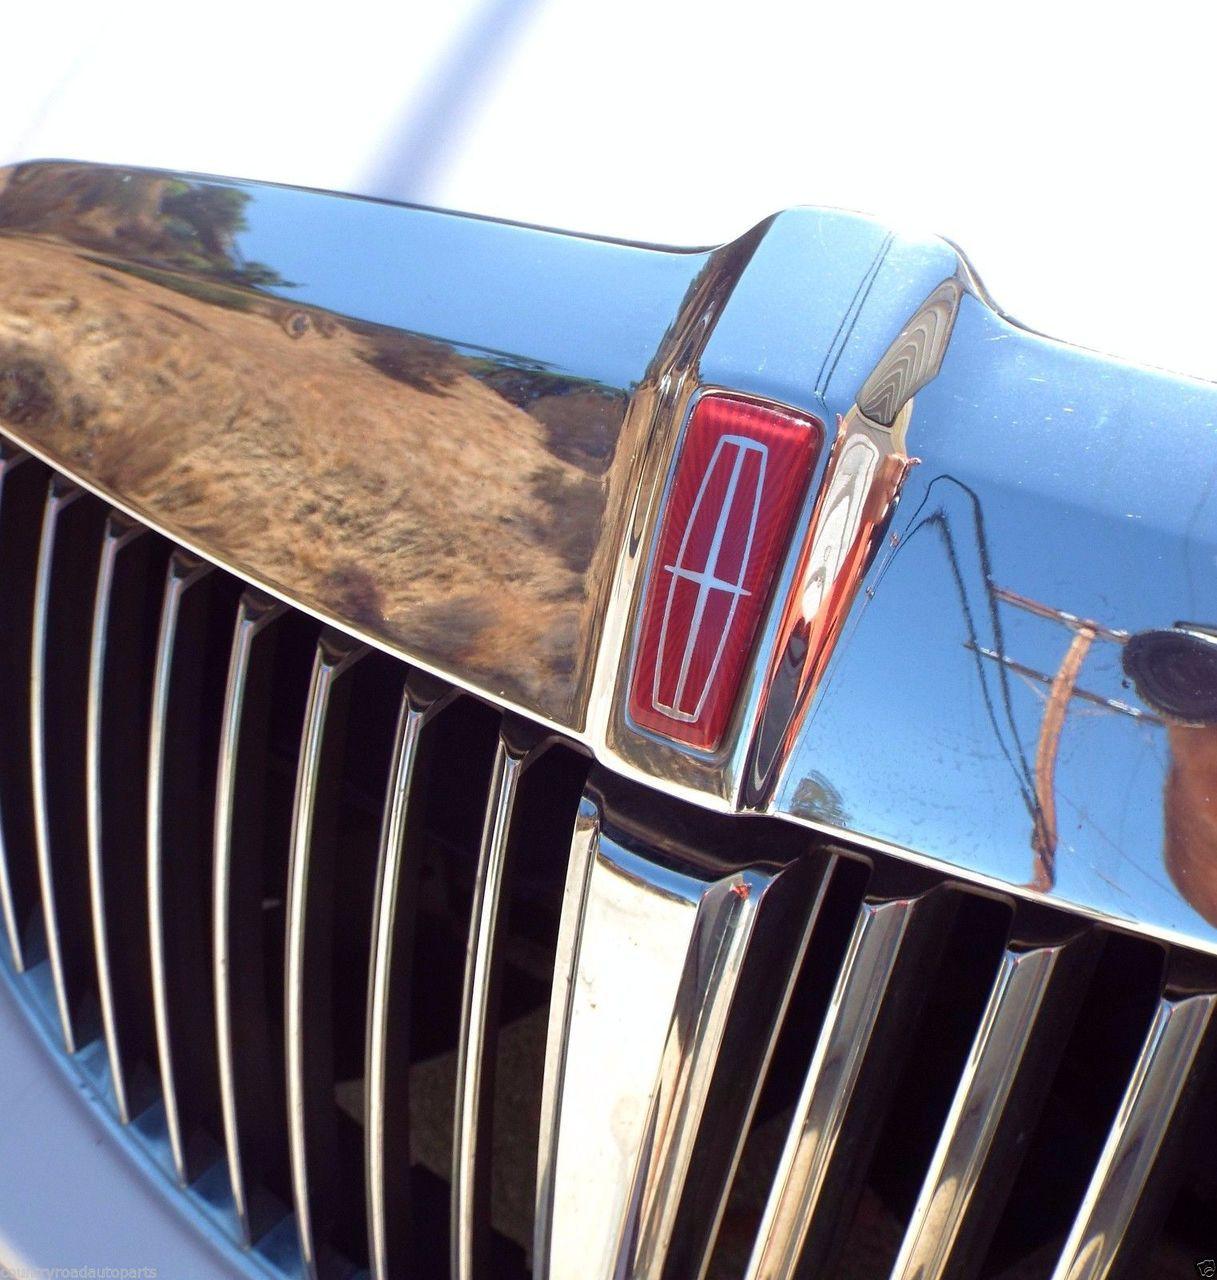 New 1998-1999-2000-2001-2002 Lincoln Town Car Hood Emblem-Badge  1998 Lincoln Town Car Hood-Hood Molding Emblem-Badge  1999 Lincoln Town Car Hood-Hood Molding Emblem-Badge  2000 Lincoln Town Car Hood-Hood Molding Emblem-Badge  2001 Lincoln Town Car Hood-Hood Molding Emblem-Badge  2002 Lincoln Town Car Hood-Hood Molding Emblem-Badge